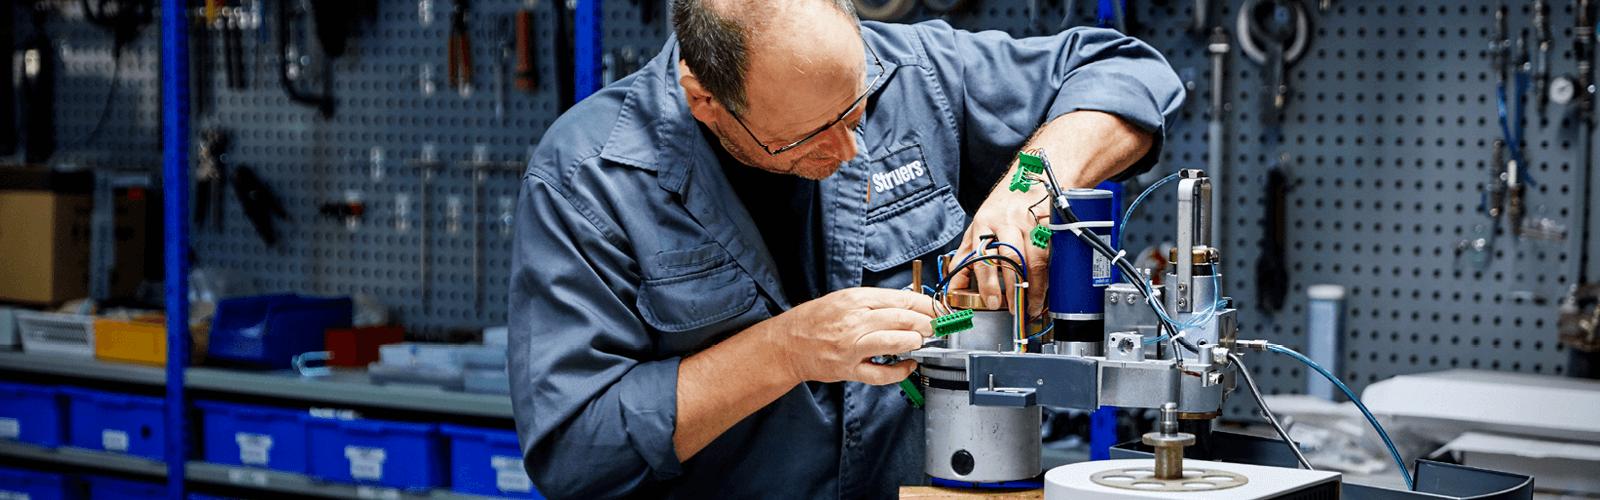 Struers Werkstatt-Reparaturservice